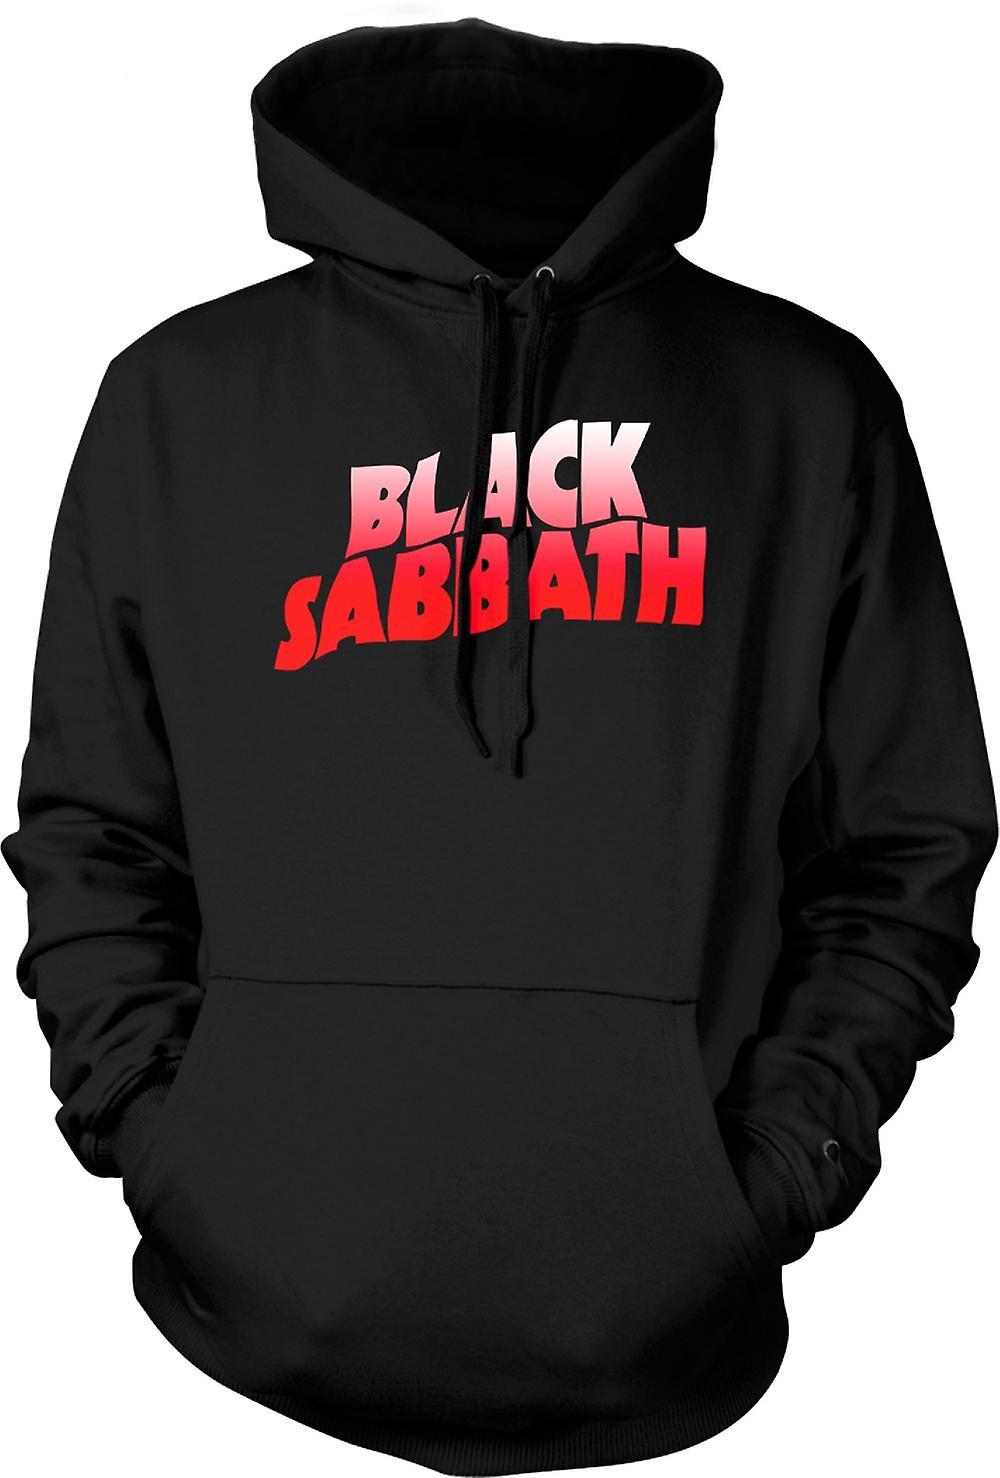 Barn Hoodie - Sabbath - Heavy Metal logotyp